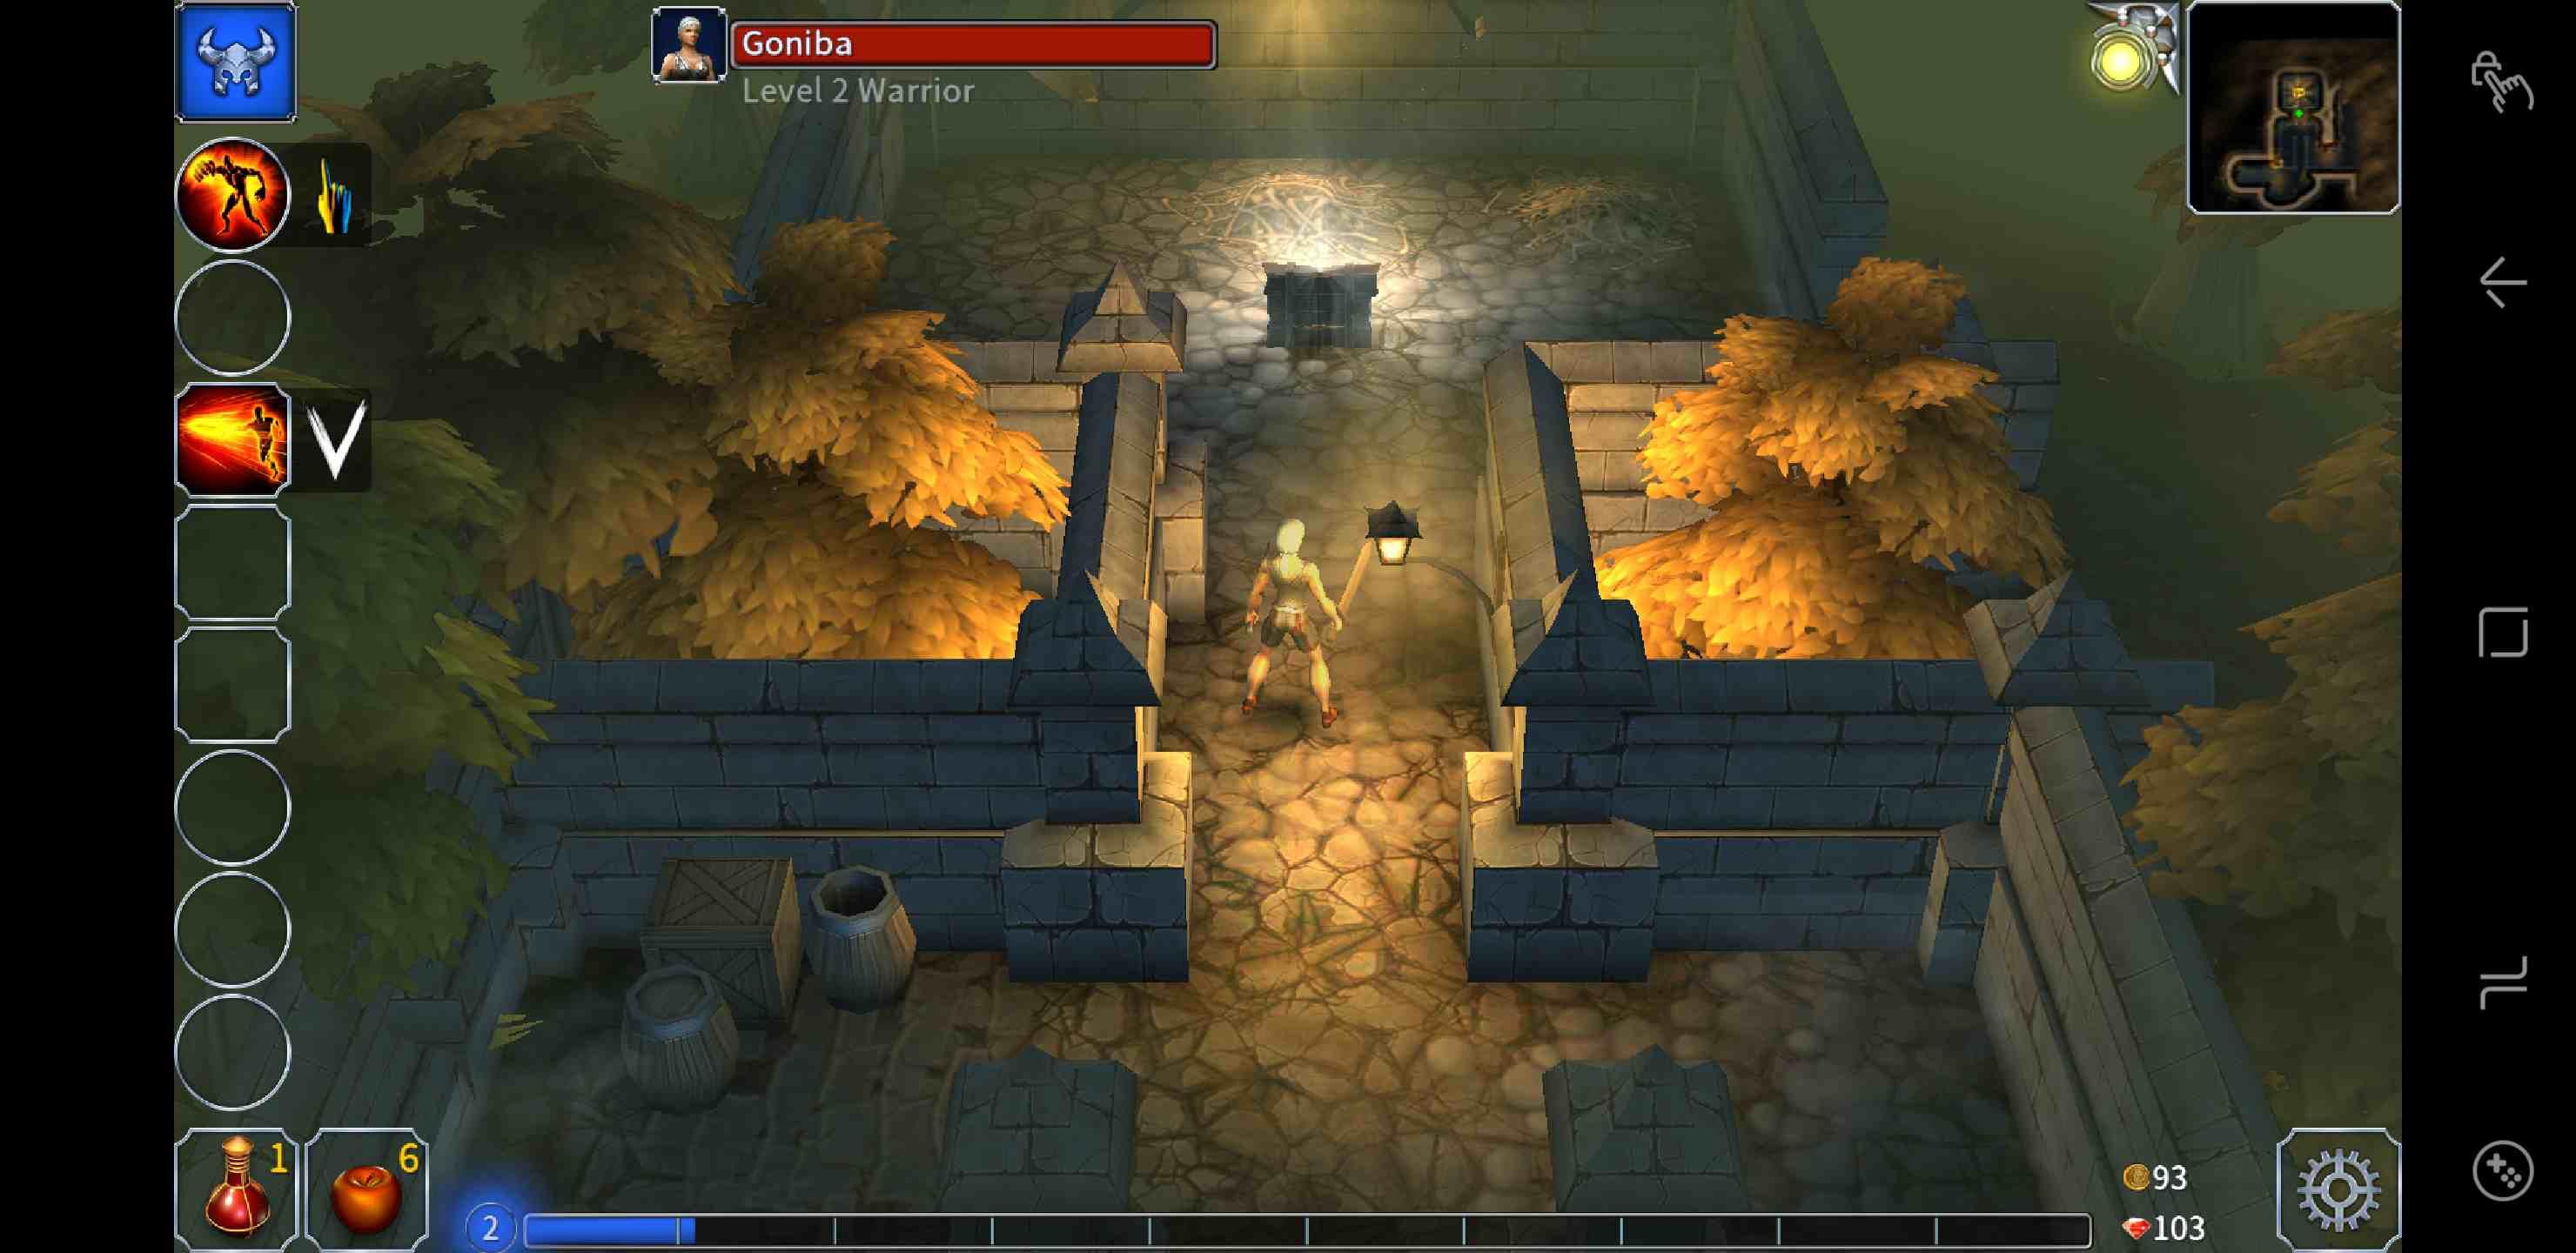 A Screenshot of the Eternium RPG for Samsung Galaxy Note 9.